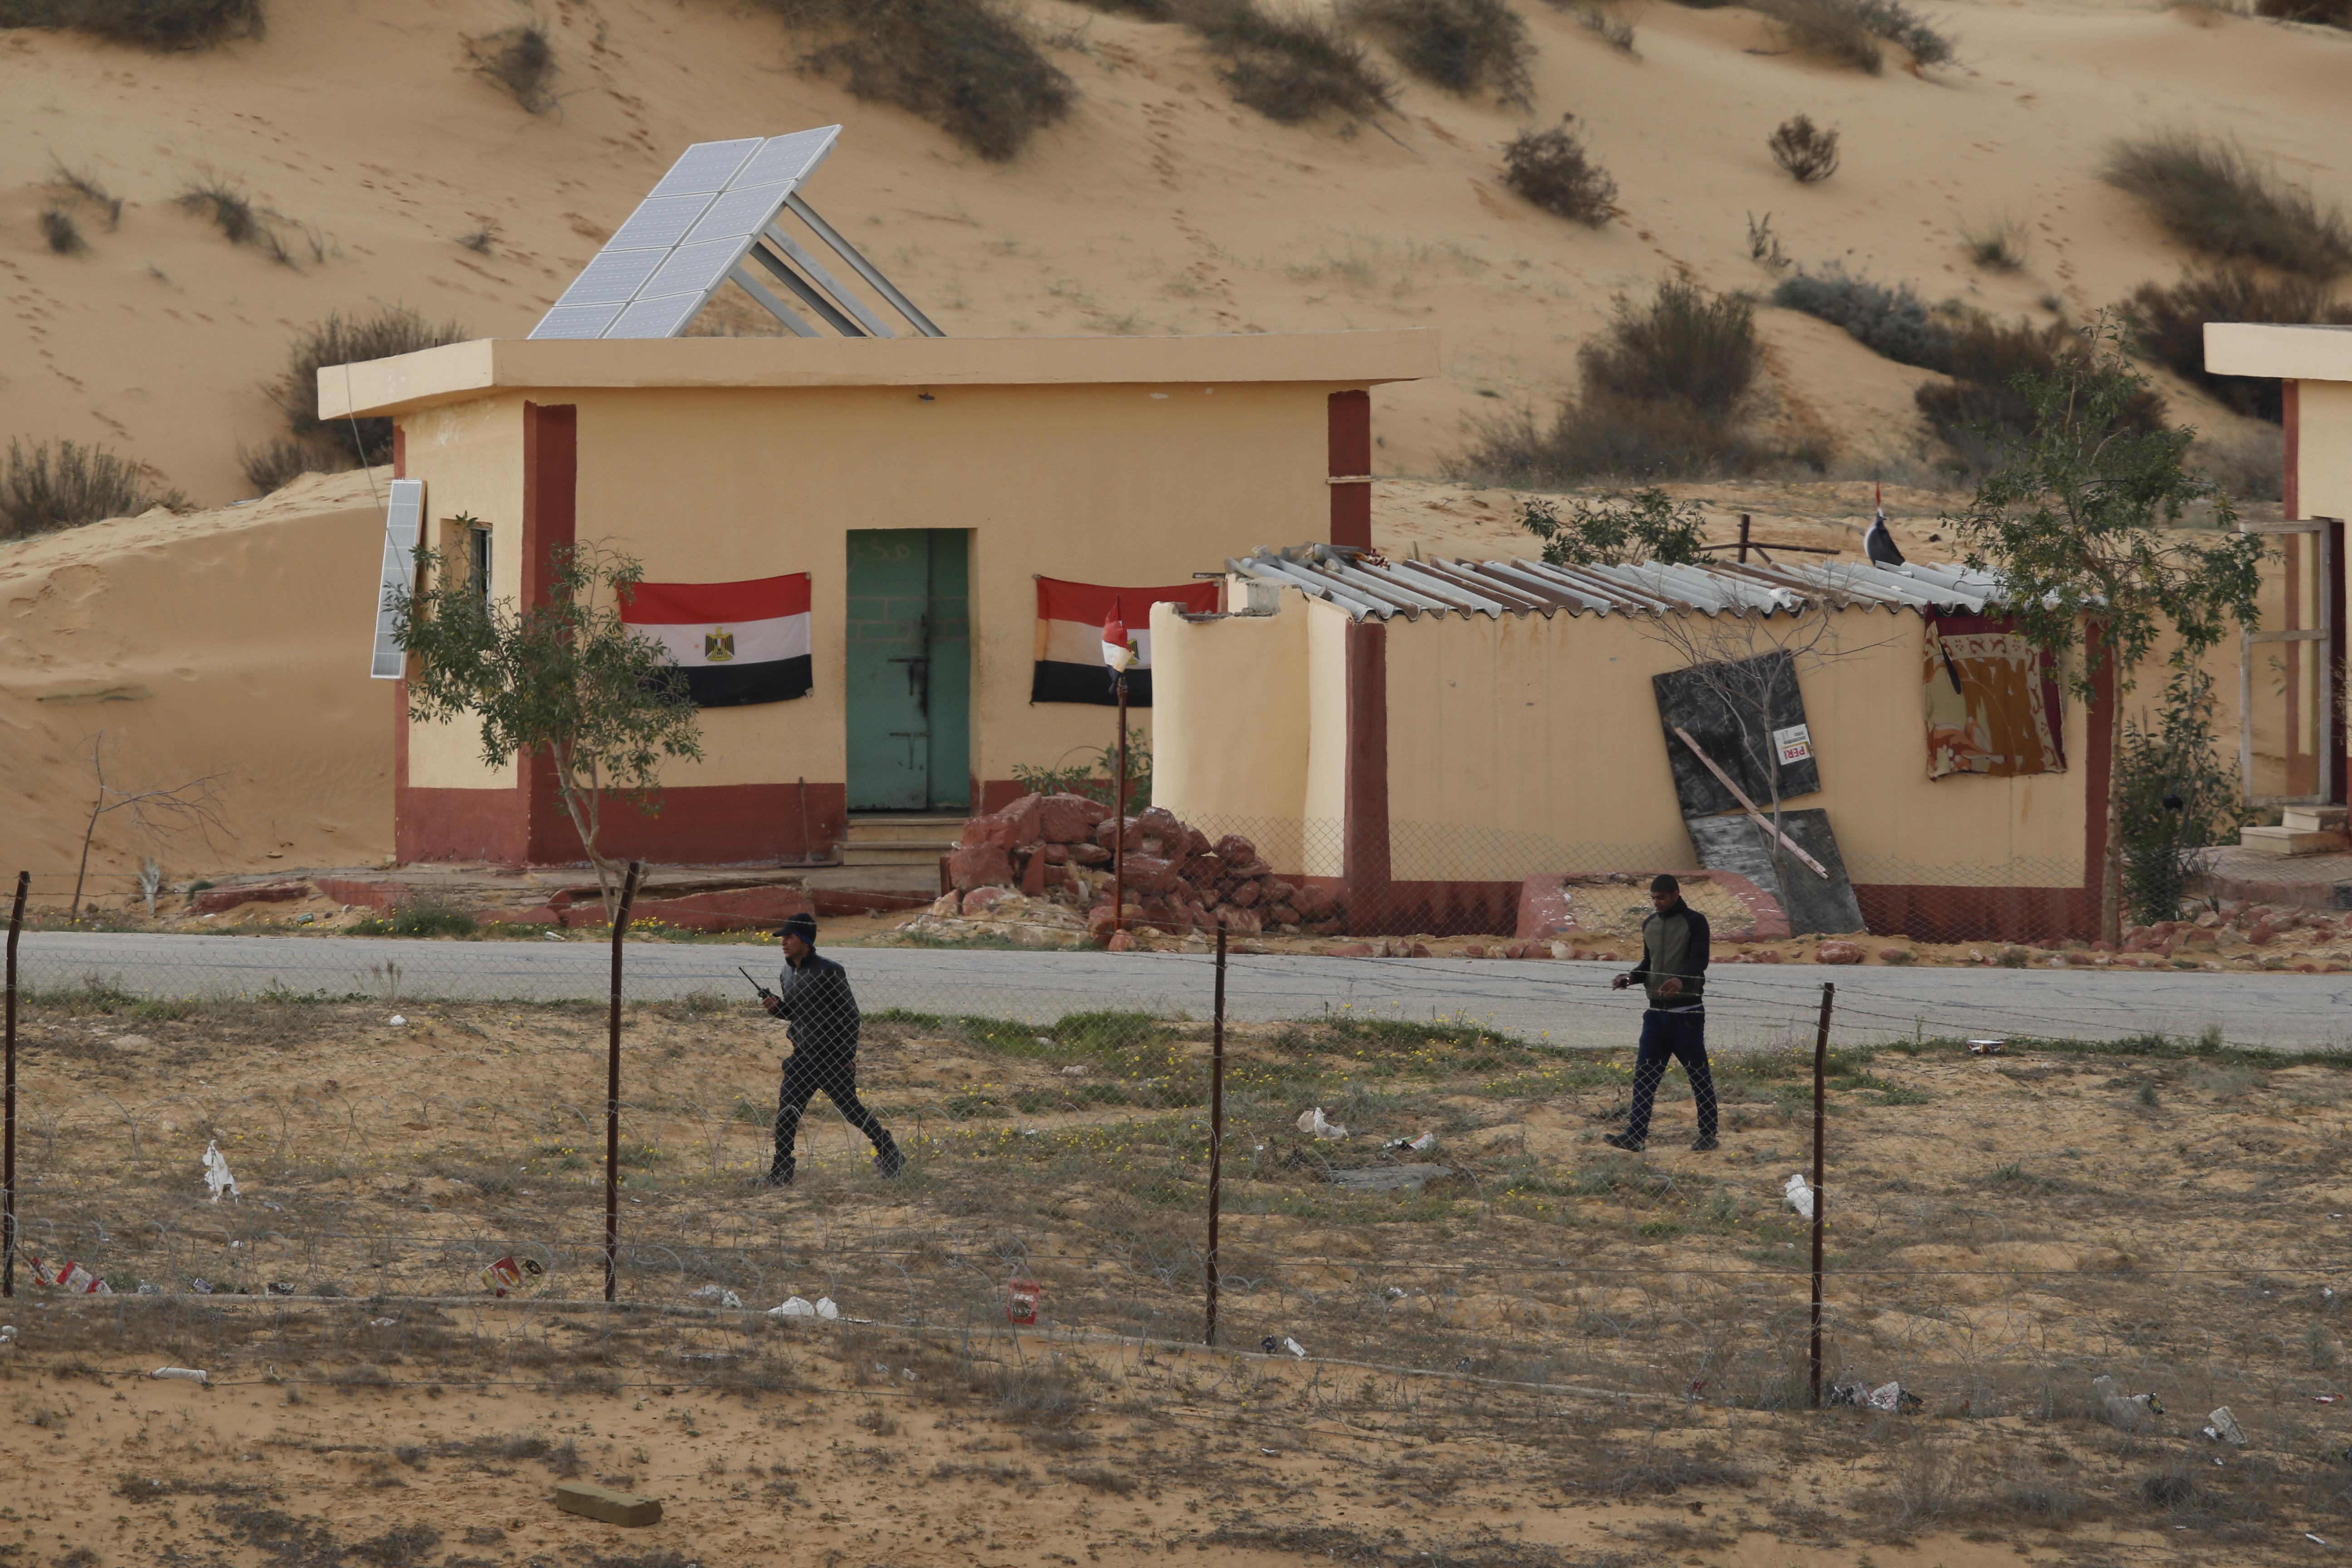 De-securitizing counterterrorism in the Sinai Peninsula